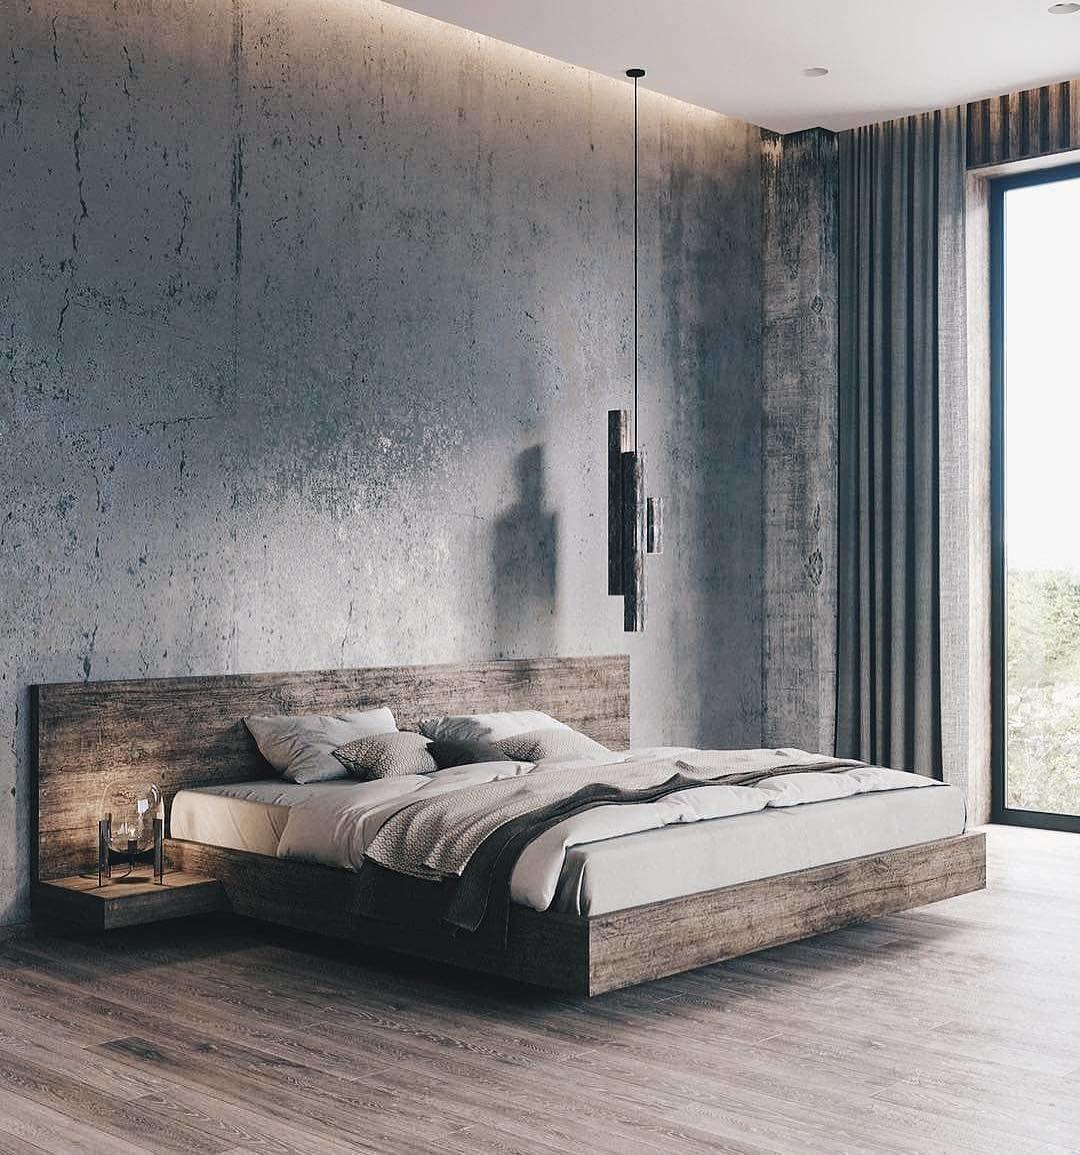 48 Bedroom Lamp Designs Are Trending In 2019 Stylish Bedroom